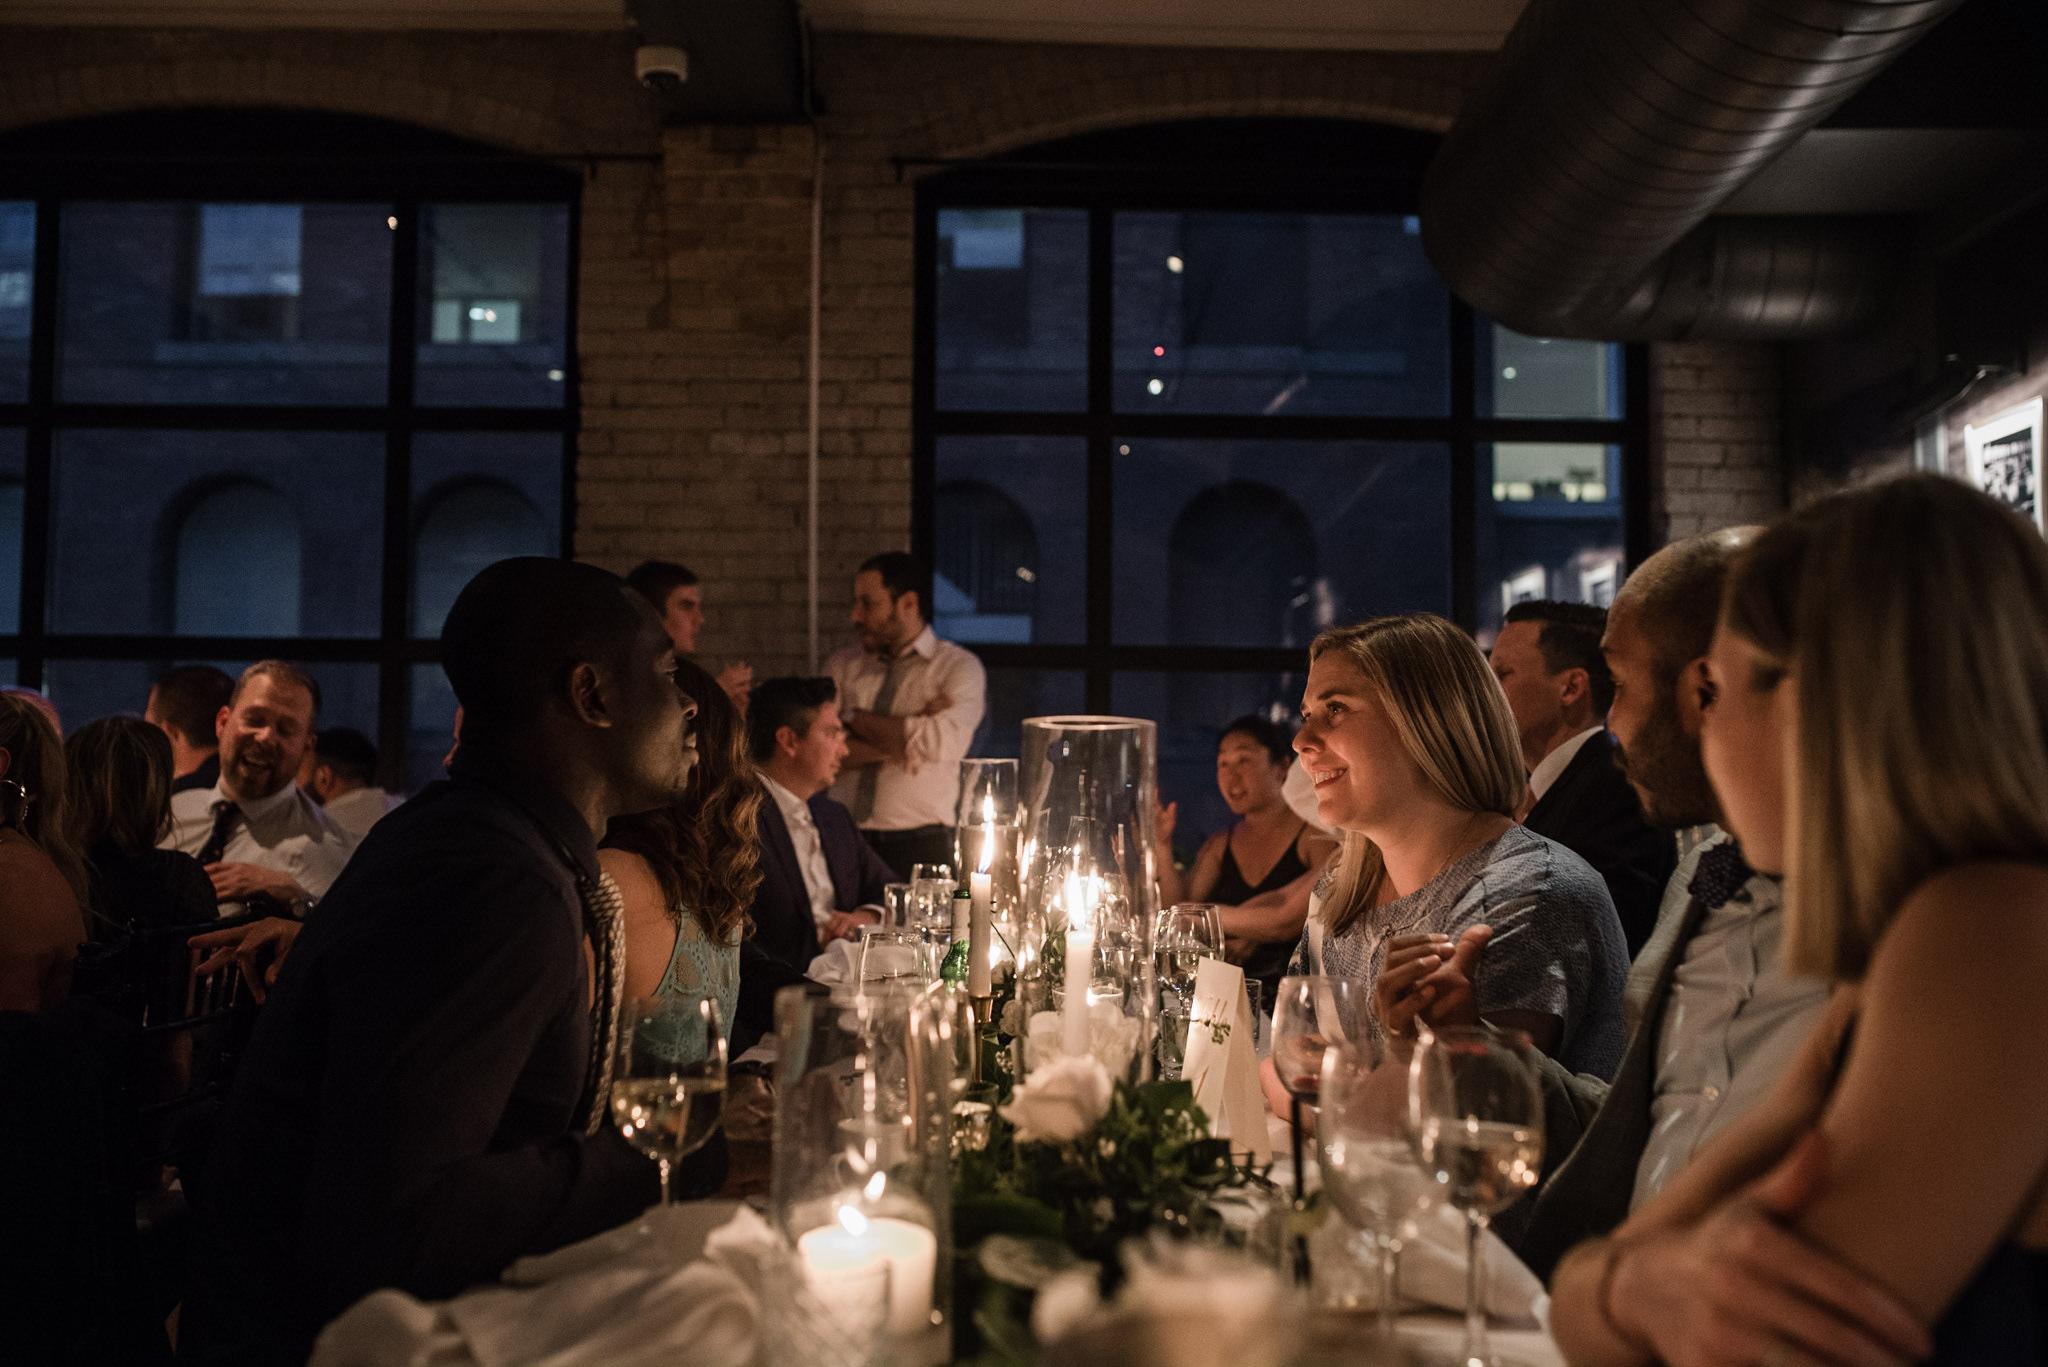 059-candlelit-reception-wedding-storys-building-romantic-toronto.jpg